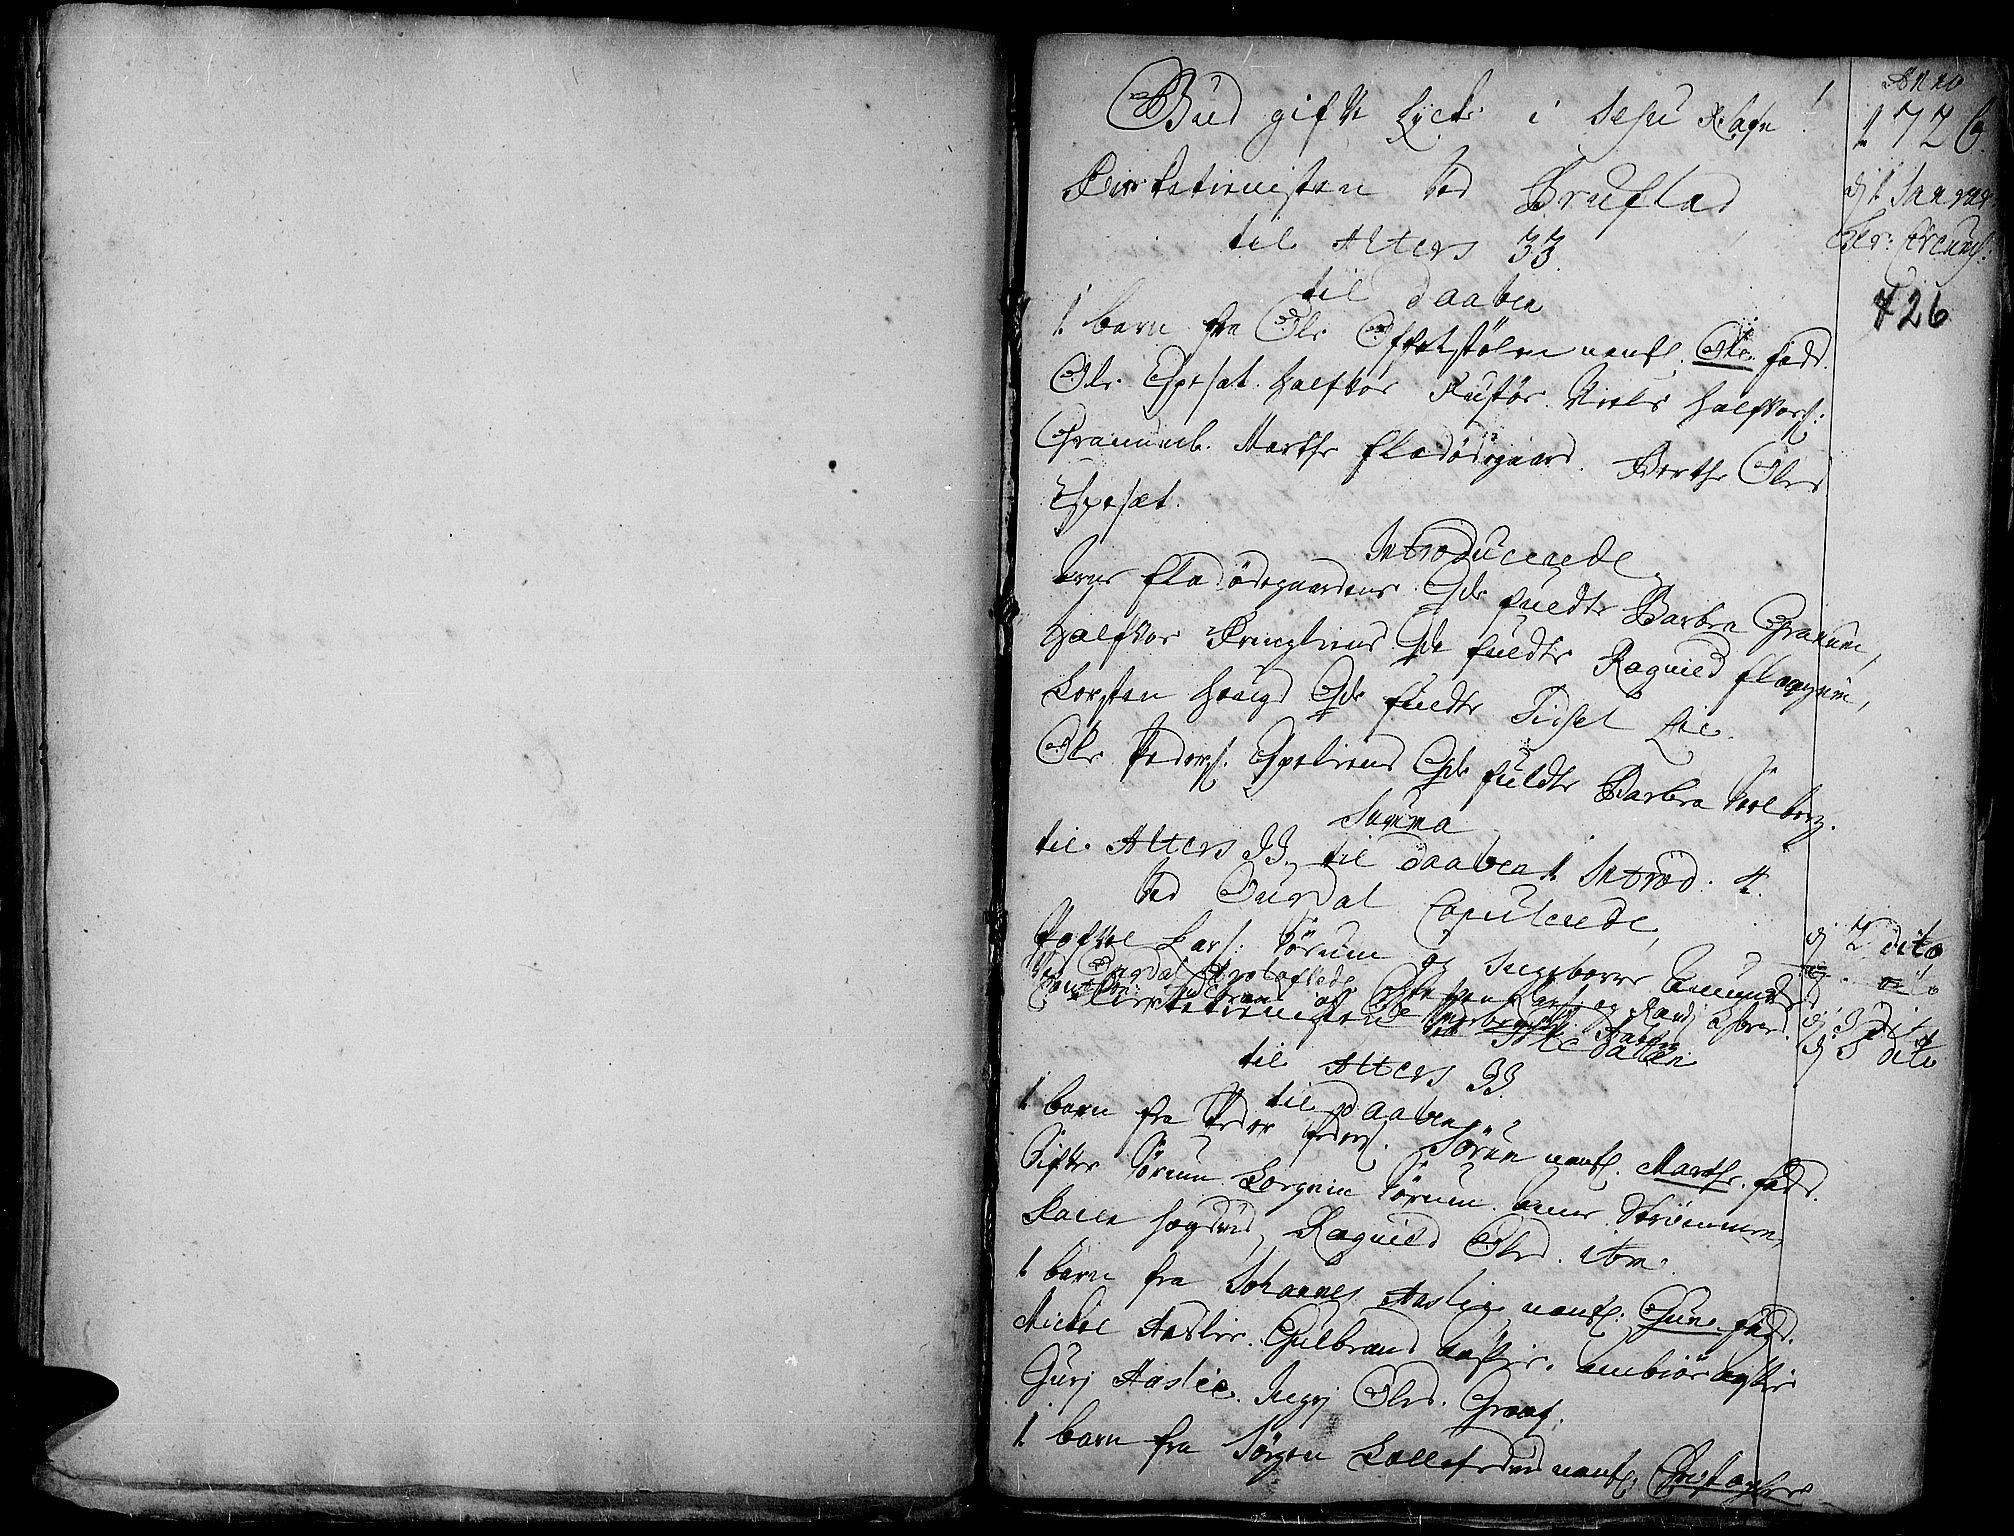 SAH, Aurdal prestekontor, Ministerialbok nr. 1-3, 1692-1730, s. 726